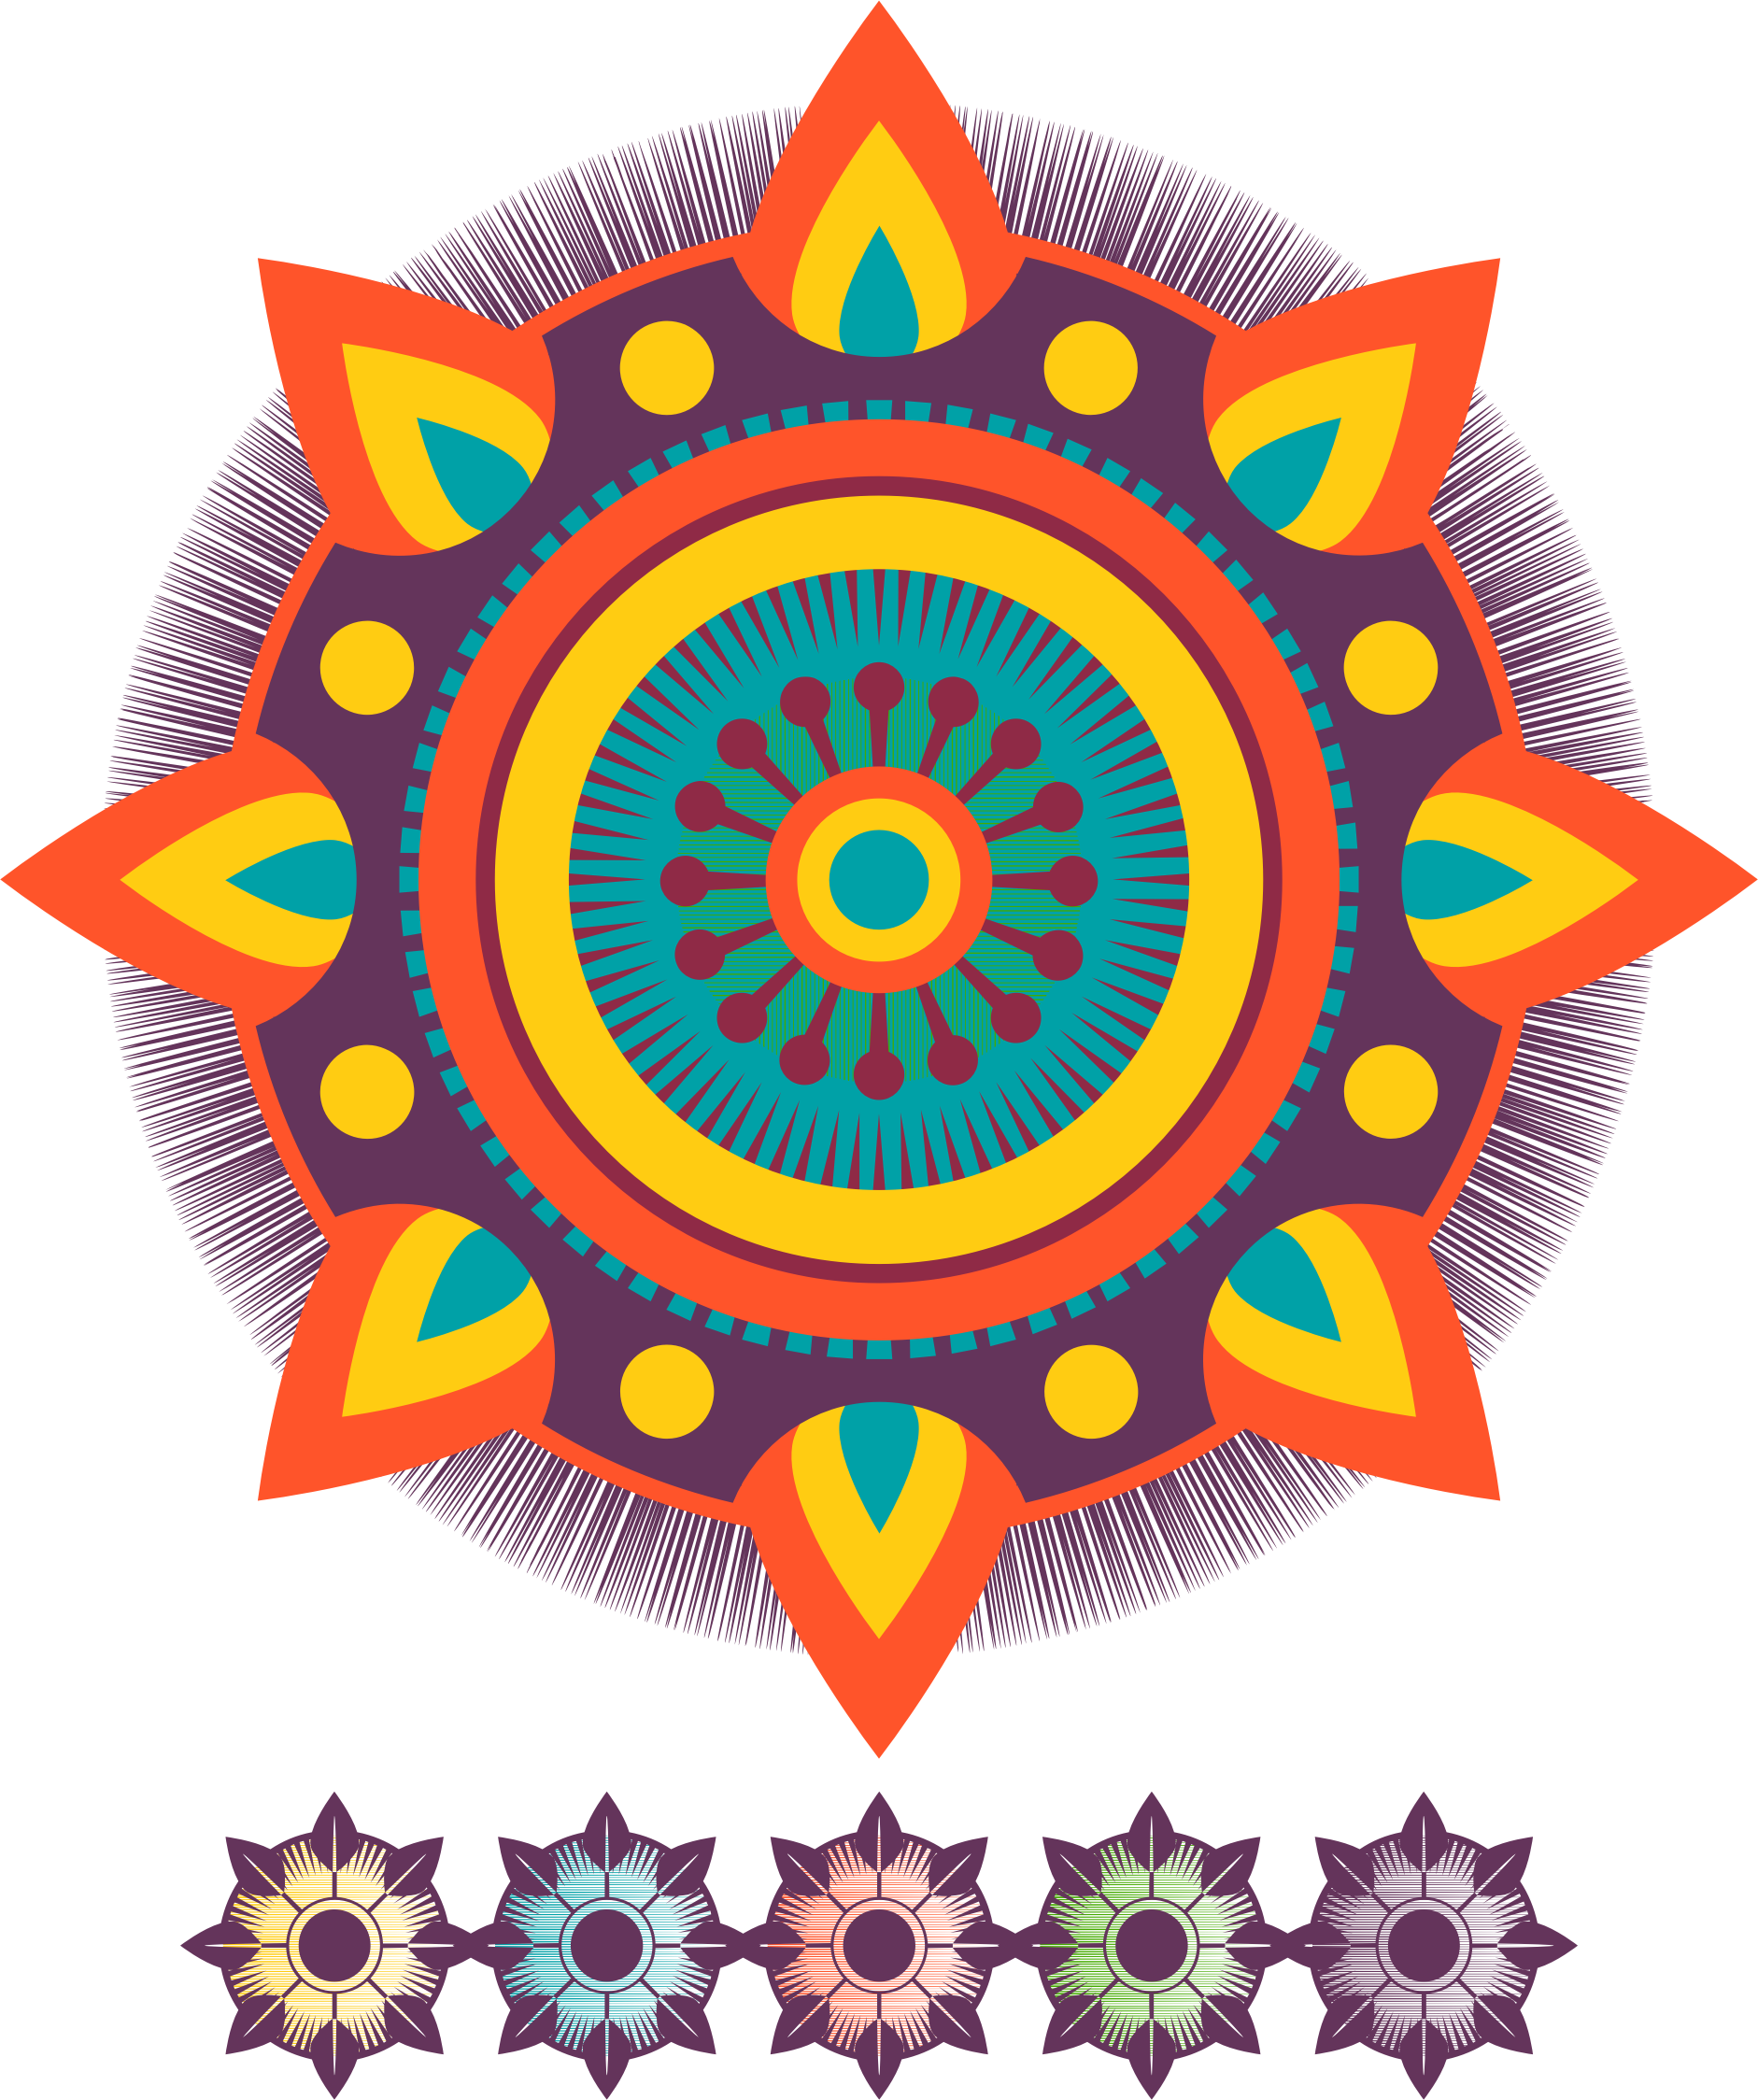 svg free library Mandala clipart basic simple. Flames big image png.